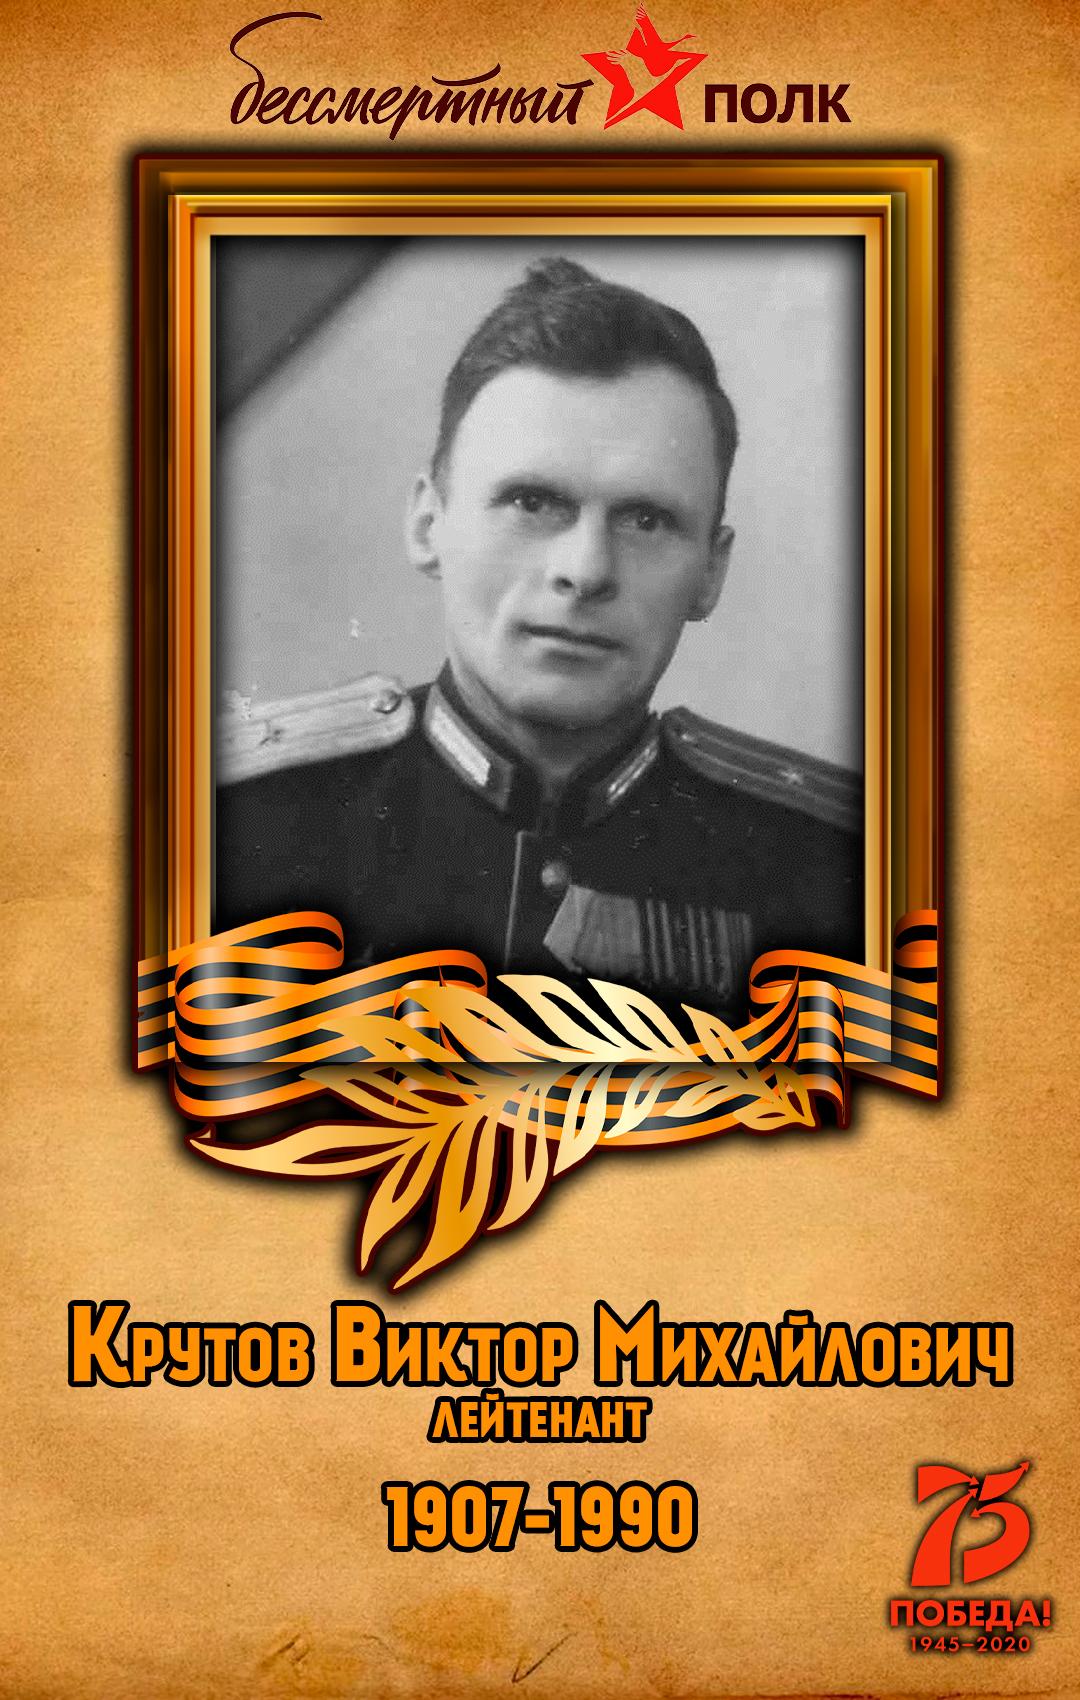 Крутов-Виктор-Михайлович